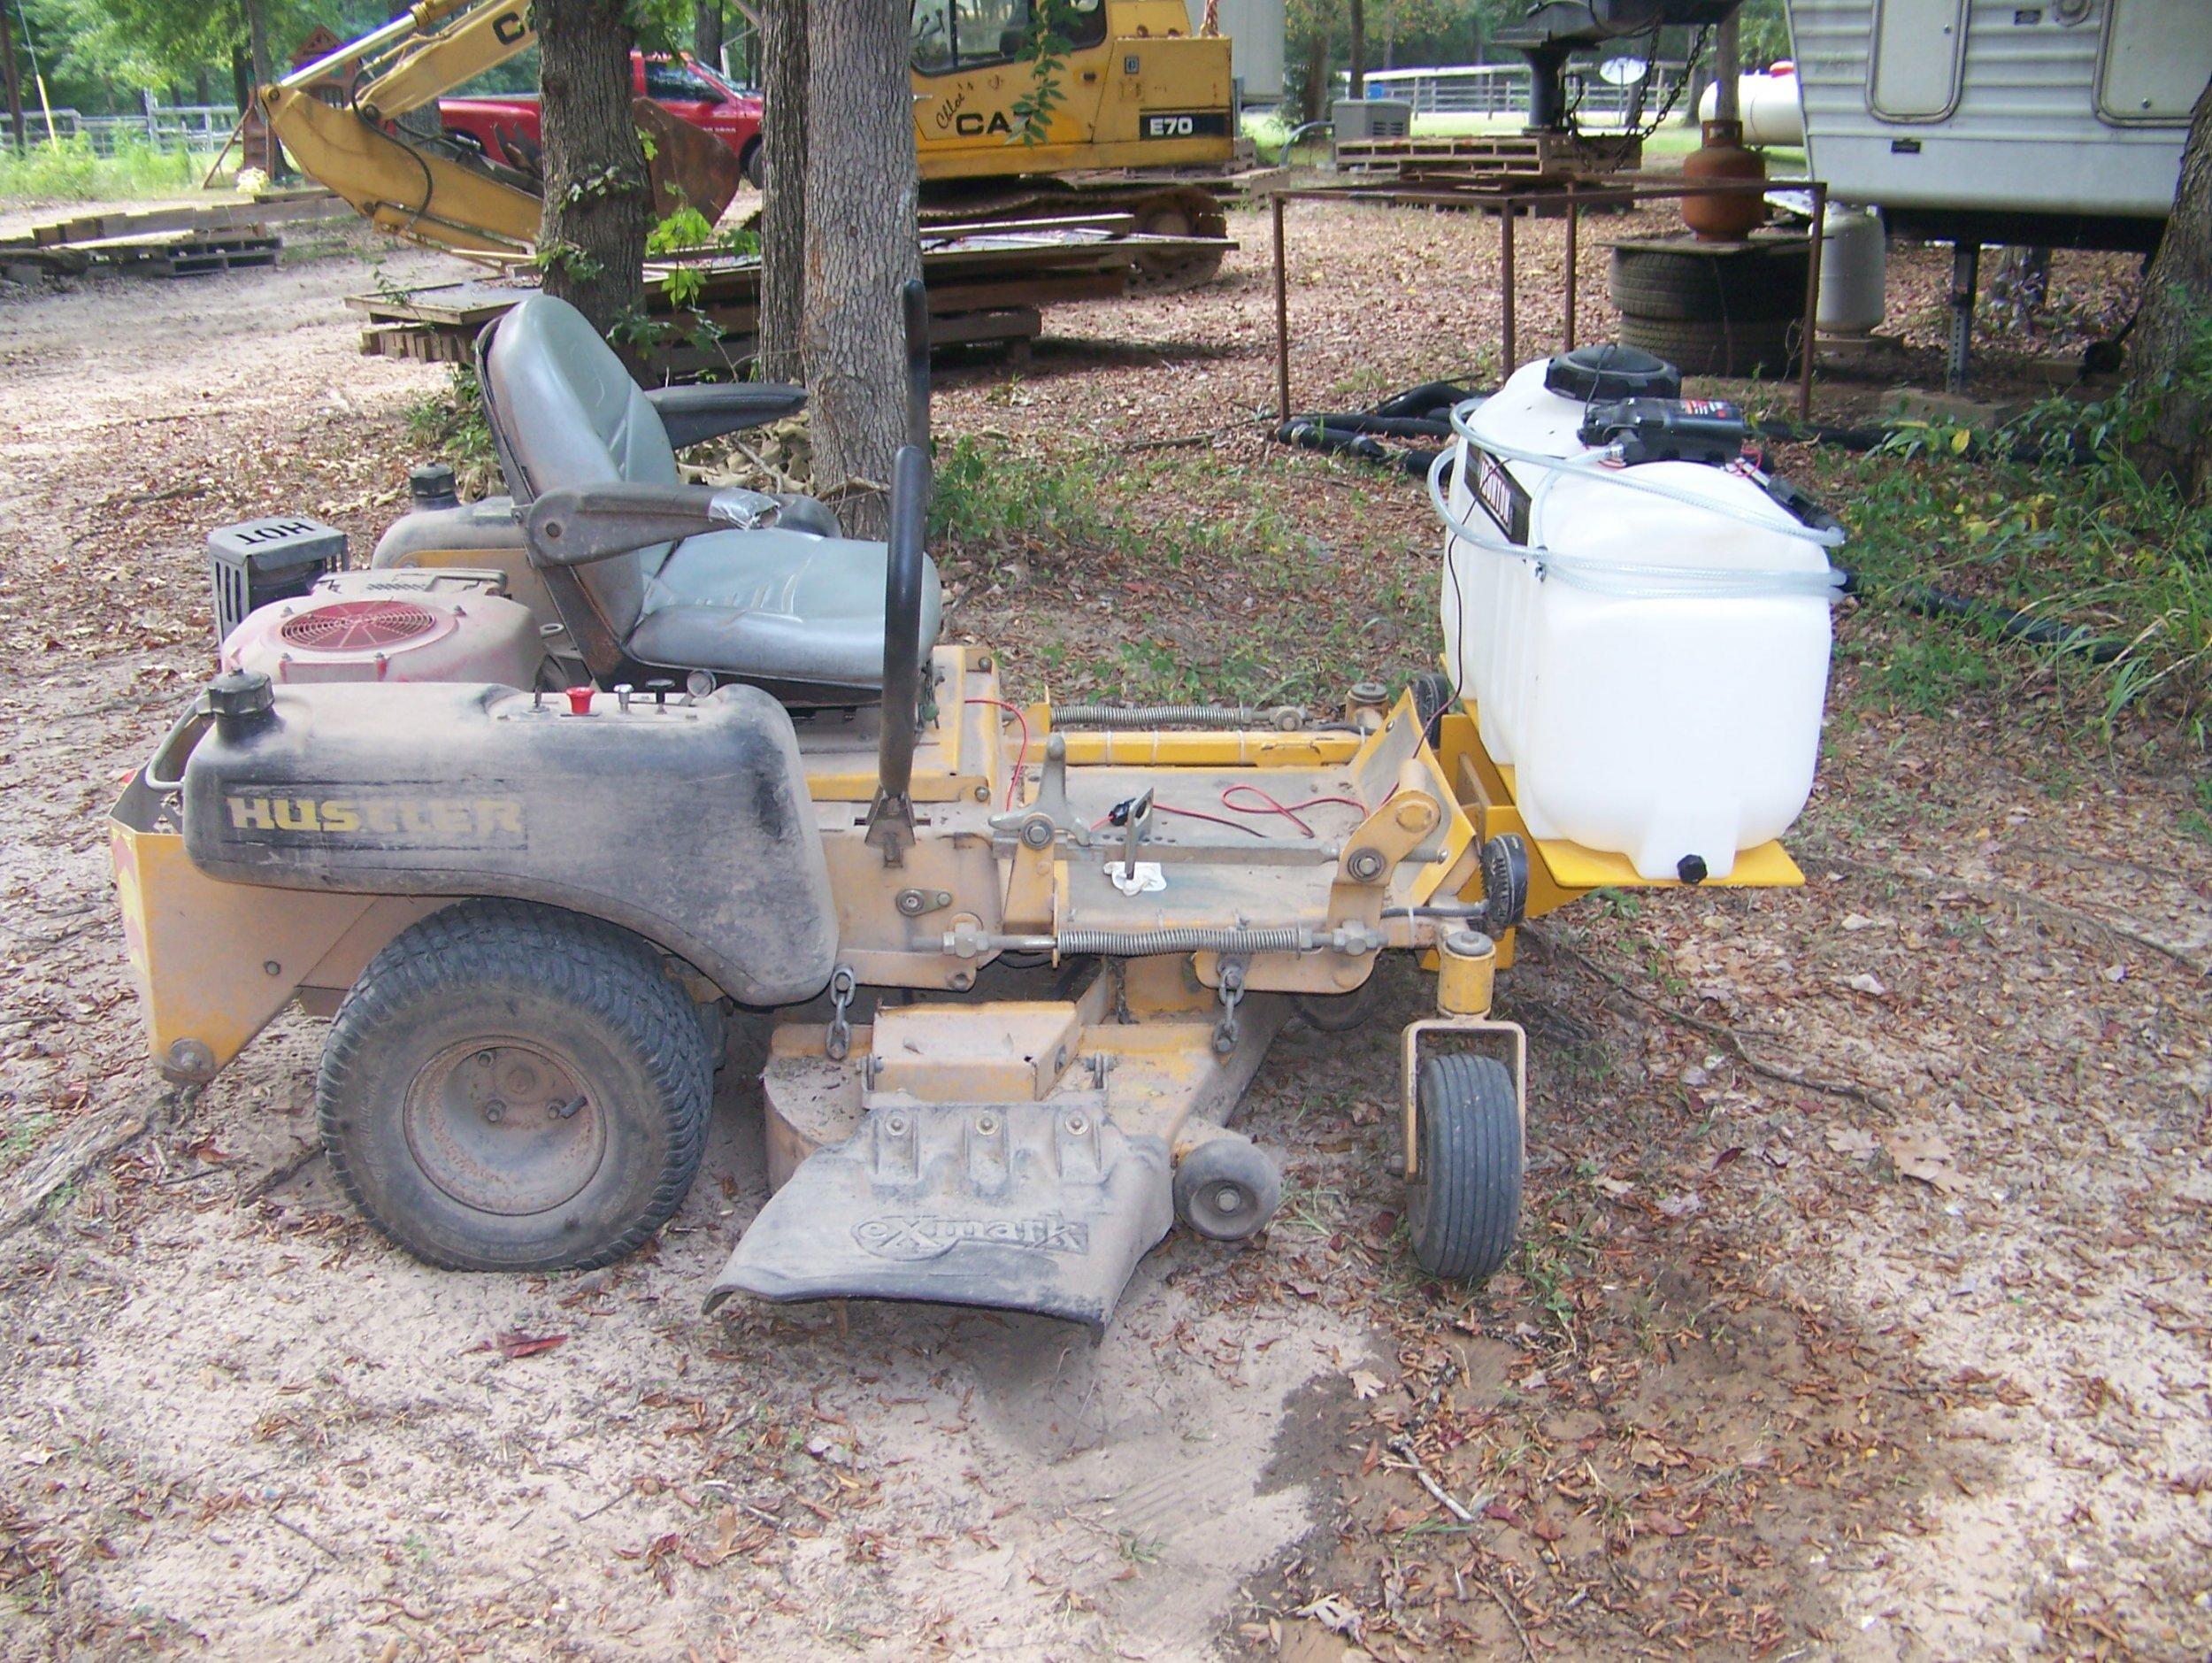 Lawnmower Sprayer Ready To Spray Profile.jpg